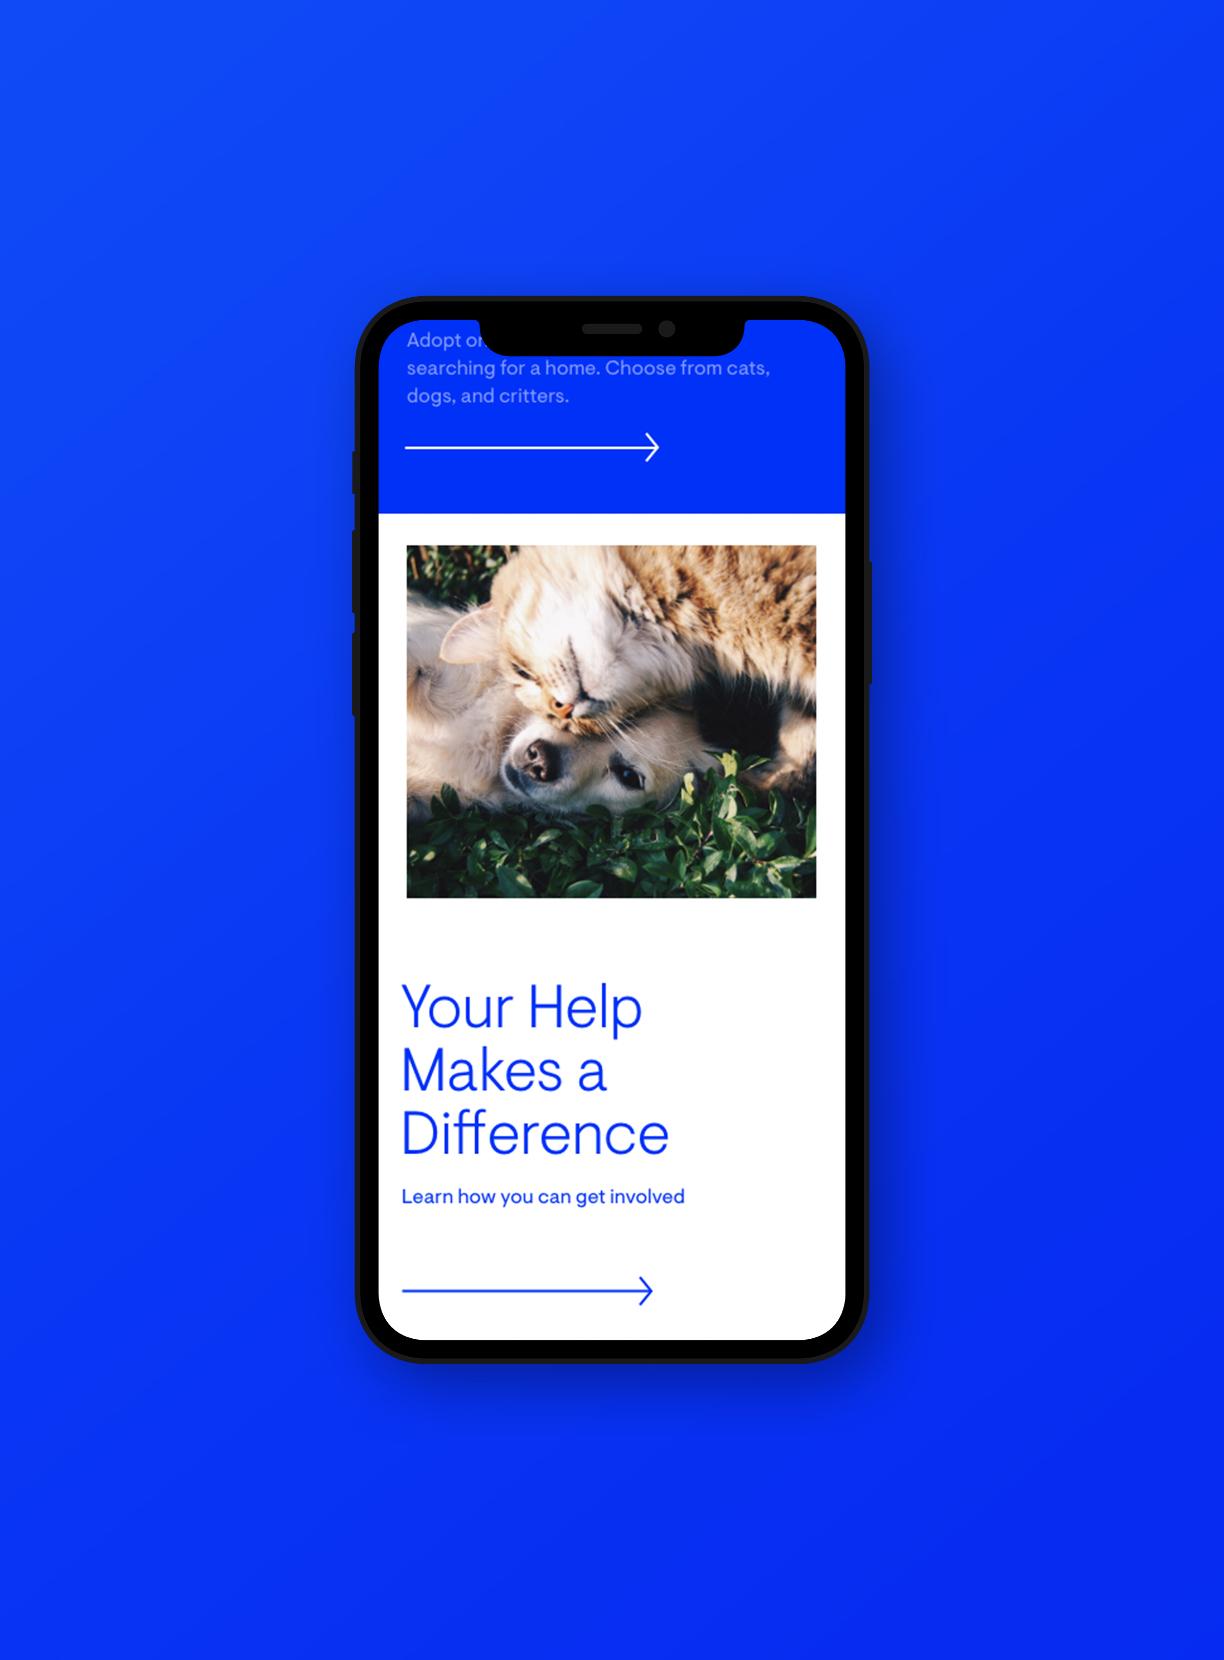 CHS mobile version mockup on blue background